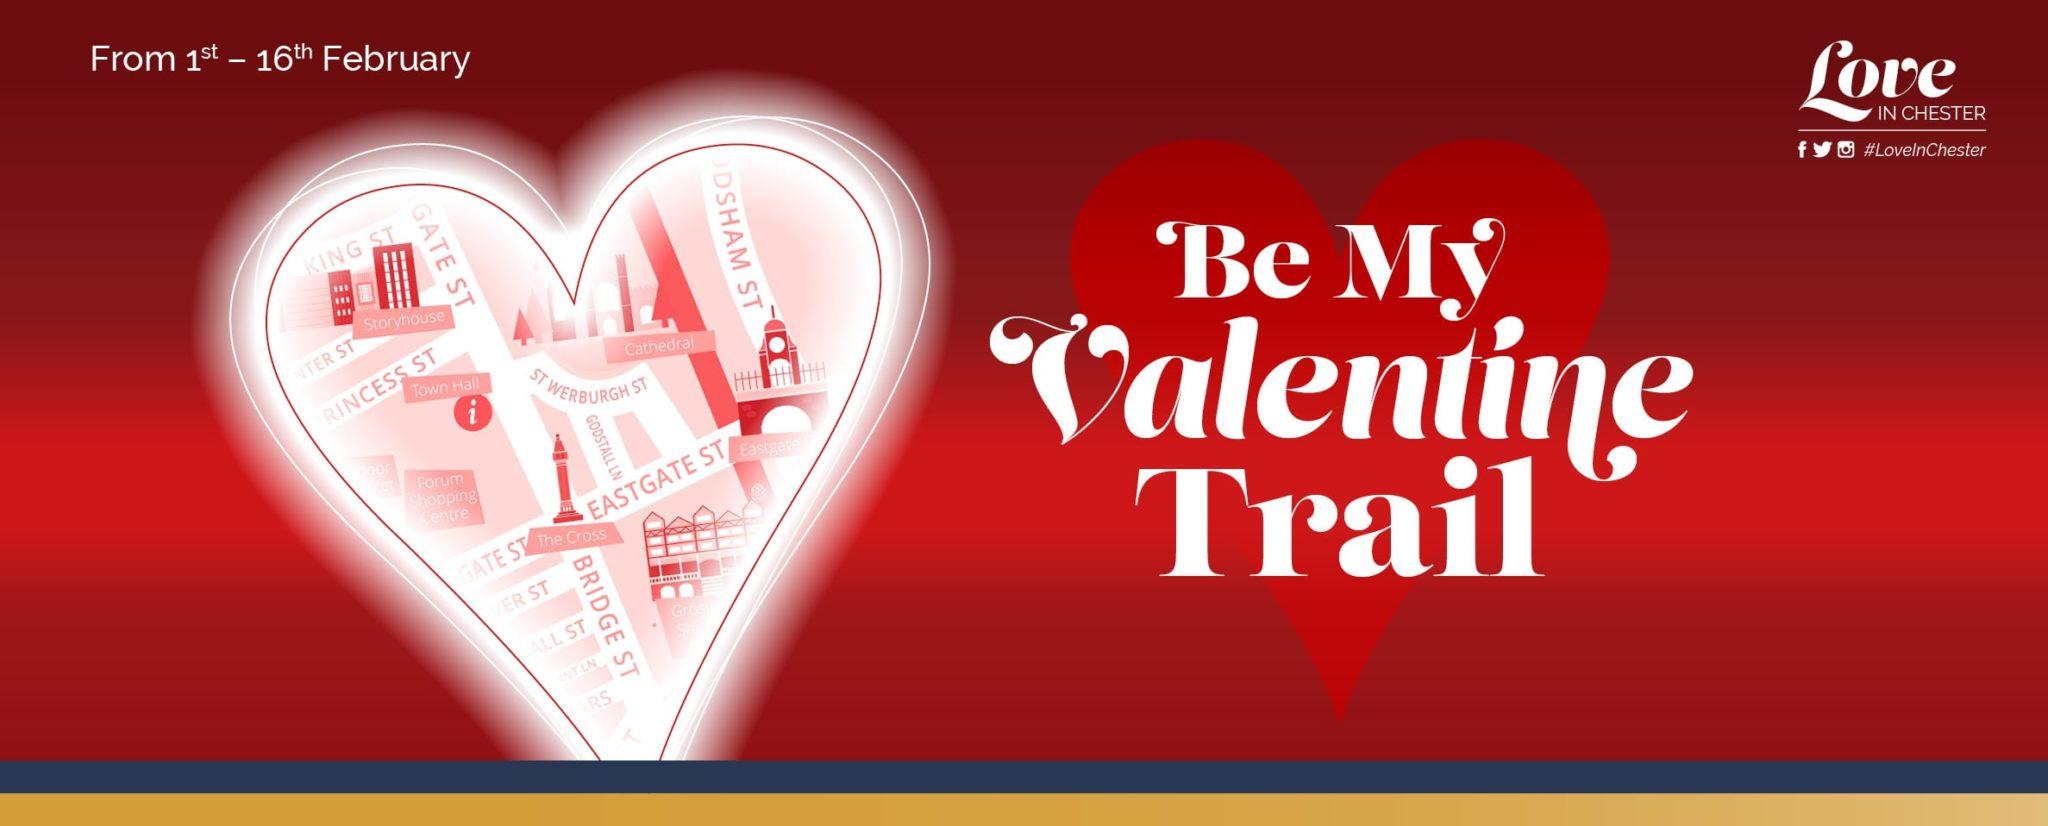 Be My Valentine Trail